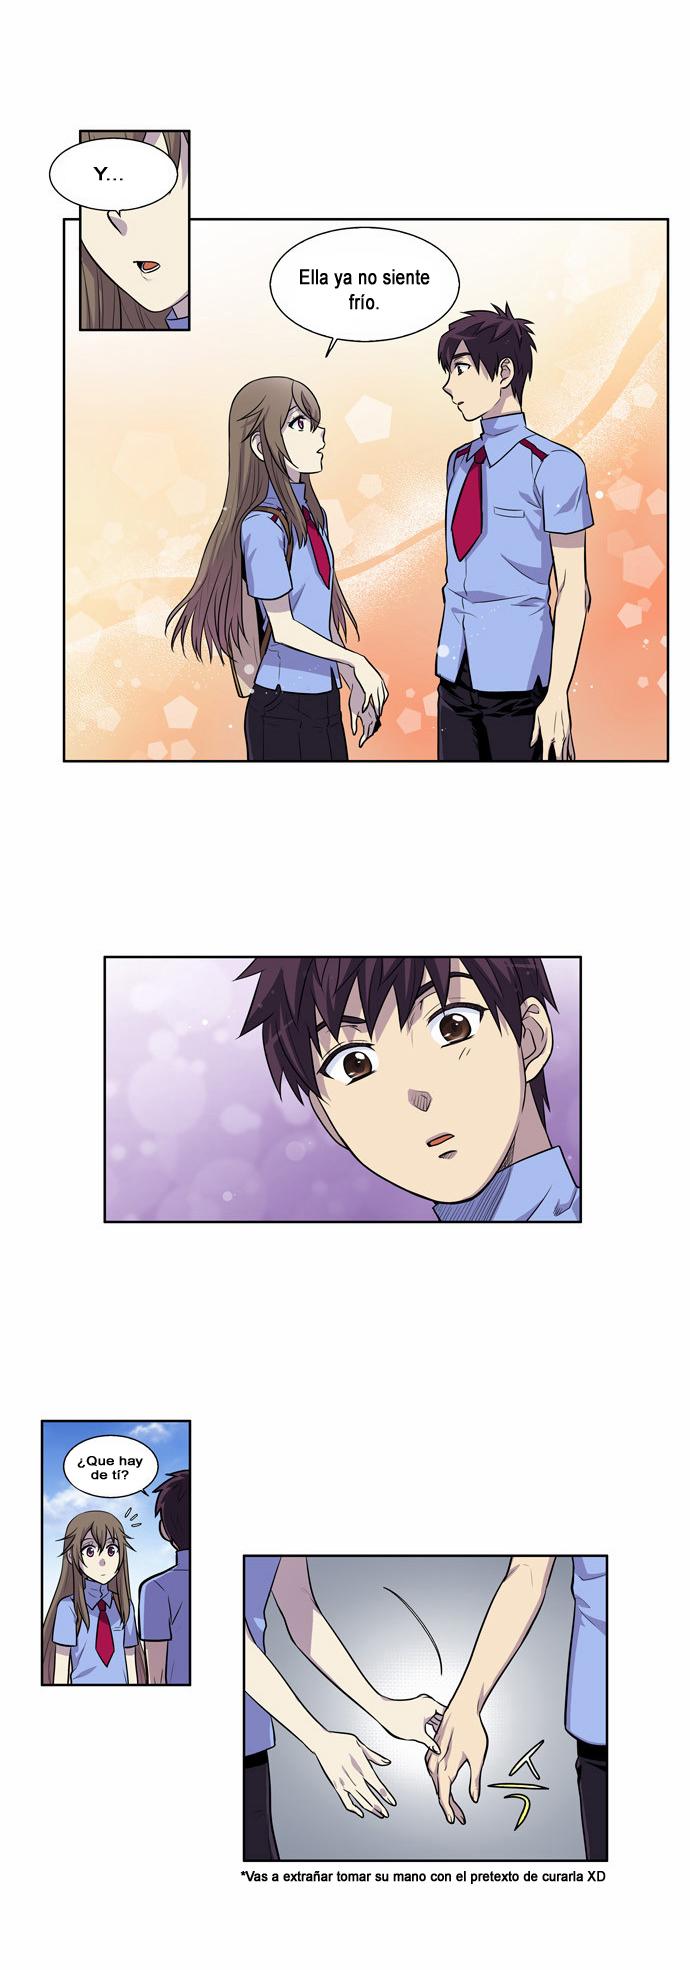 http://c5.ninemanga.com/es_manga/61/1725/396912/49e43a13a38d7040007aff0be7d2f2d0.jpg Page 8